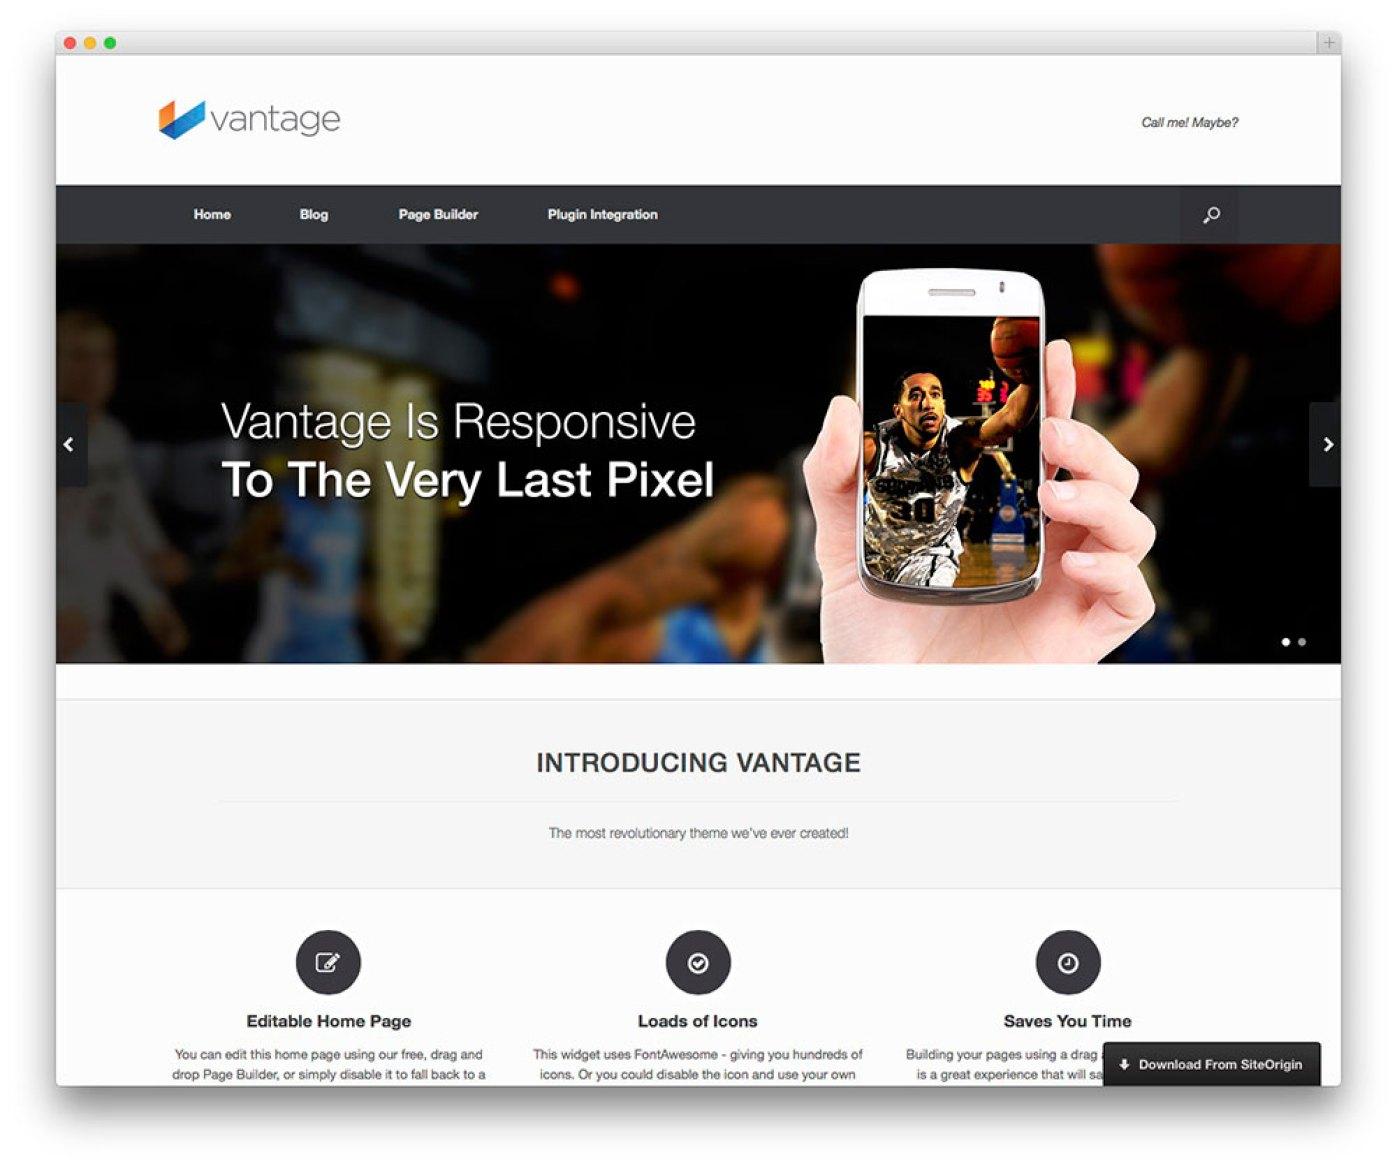 Vantage - tema vitrine aplicativo gratuito